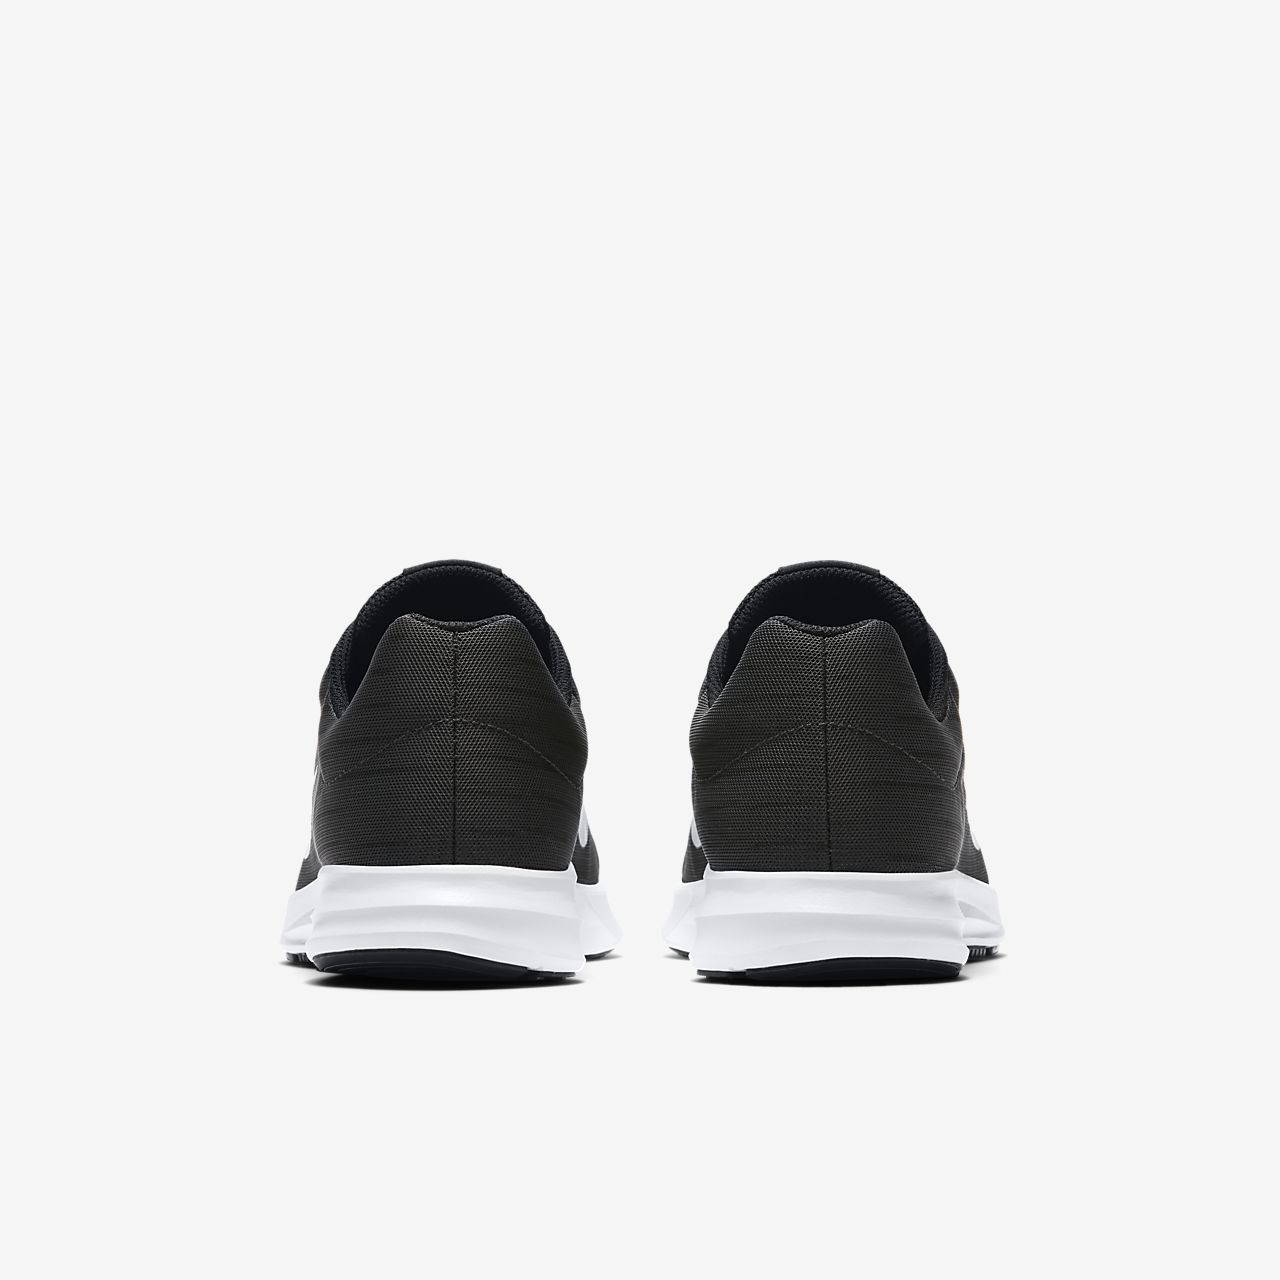 f52509f21428 Nike Downshifter 8 Older Kids  (Boys ) Running Shoe. Nike.com GB